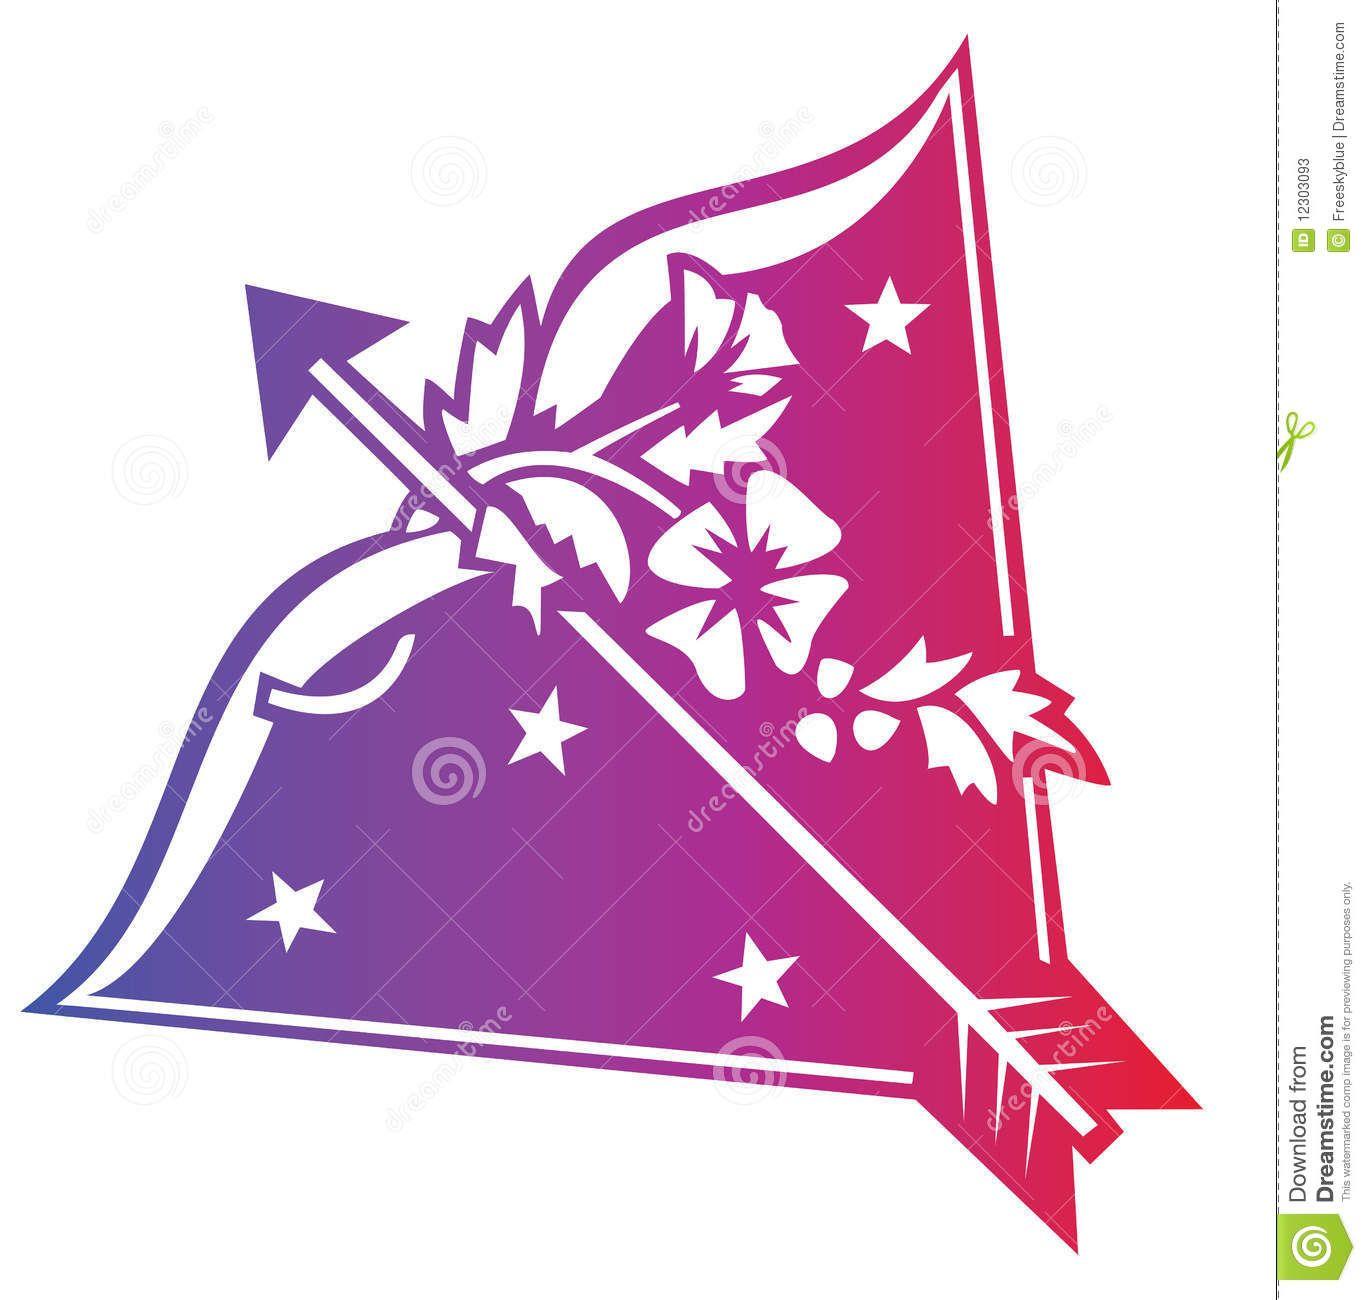 Sagittarius zodiac sign i love being a saggitarian sagittarius zodiac sign biocorpaavc